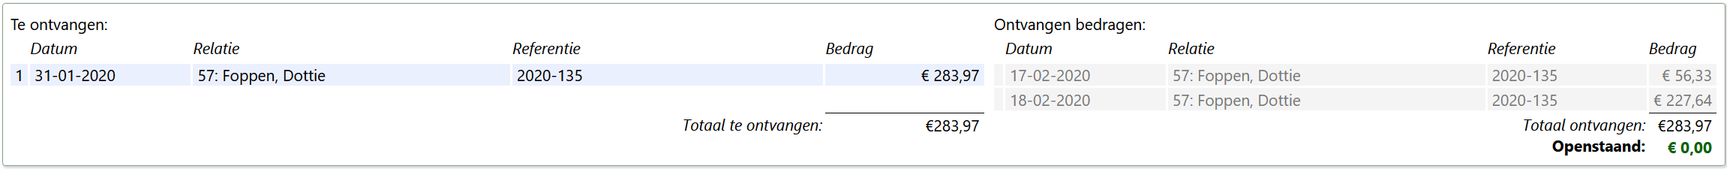 betaalprovider_koppeling.png